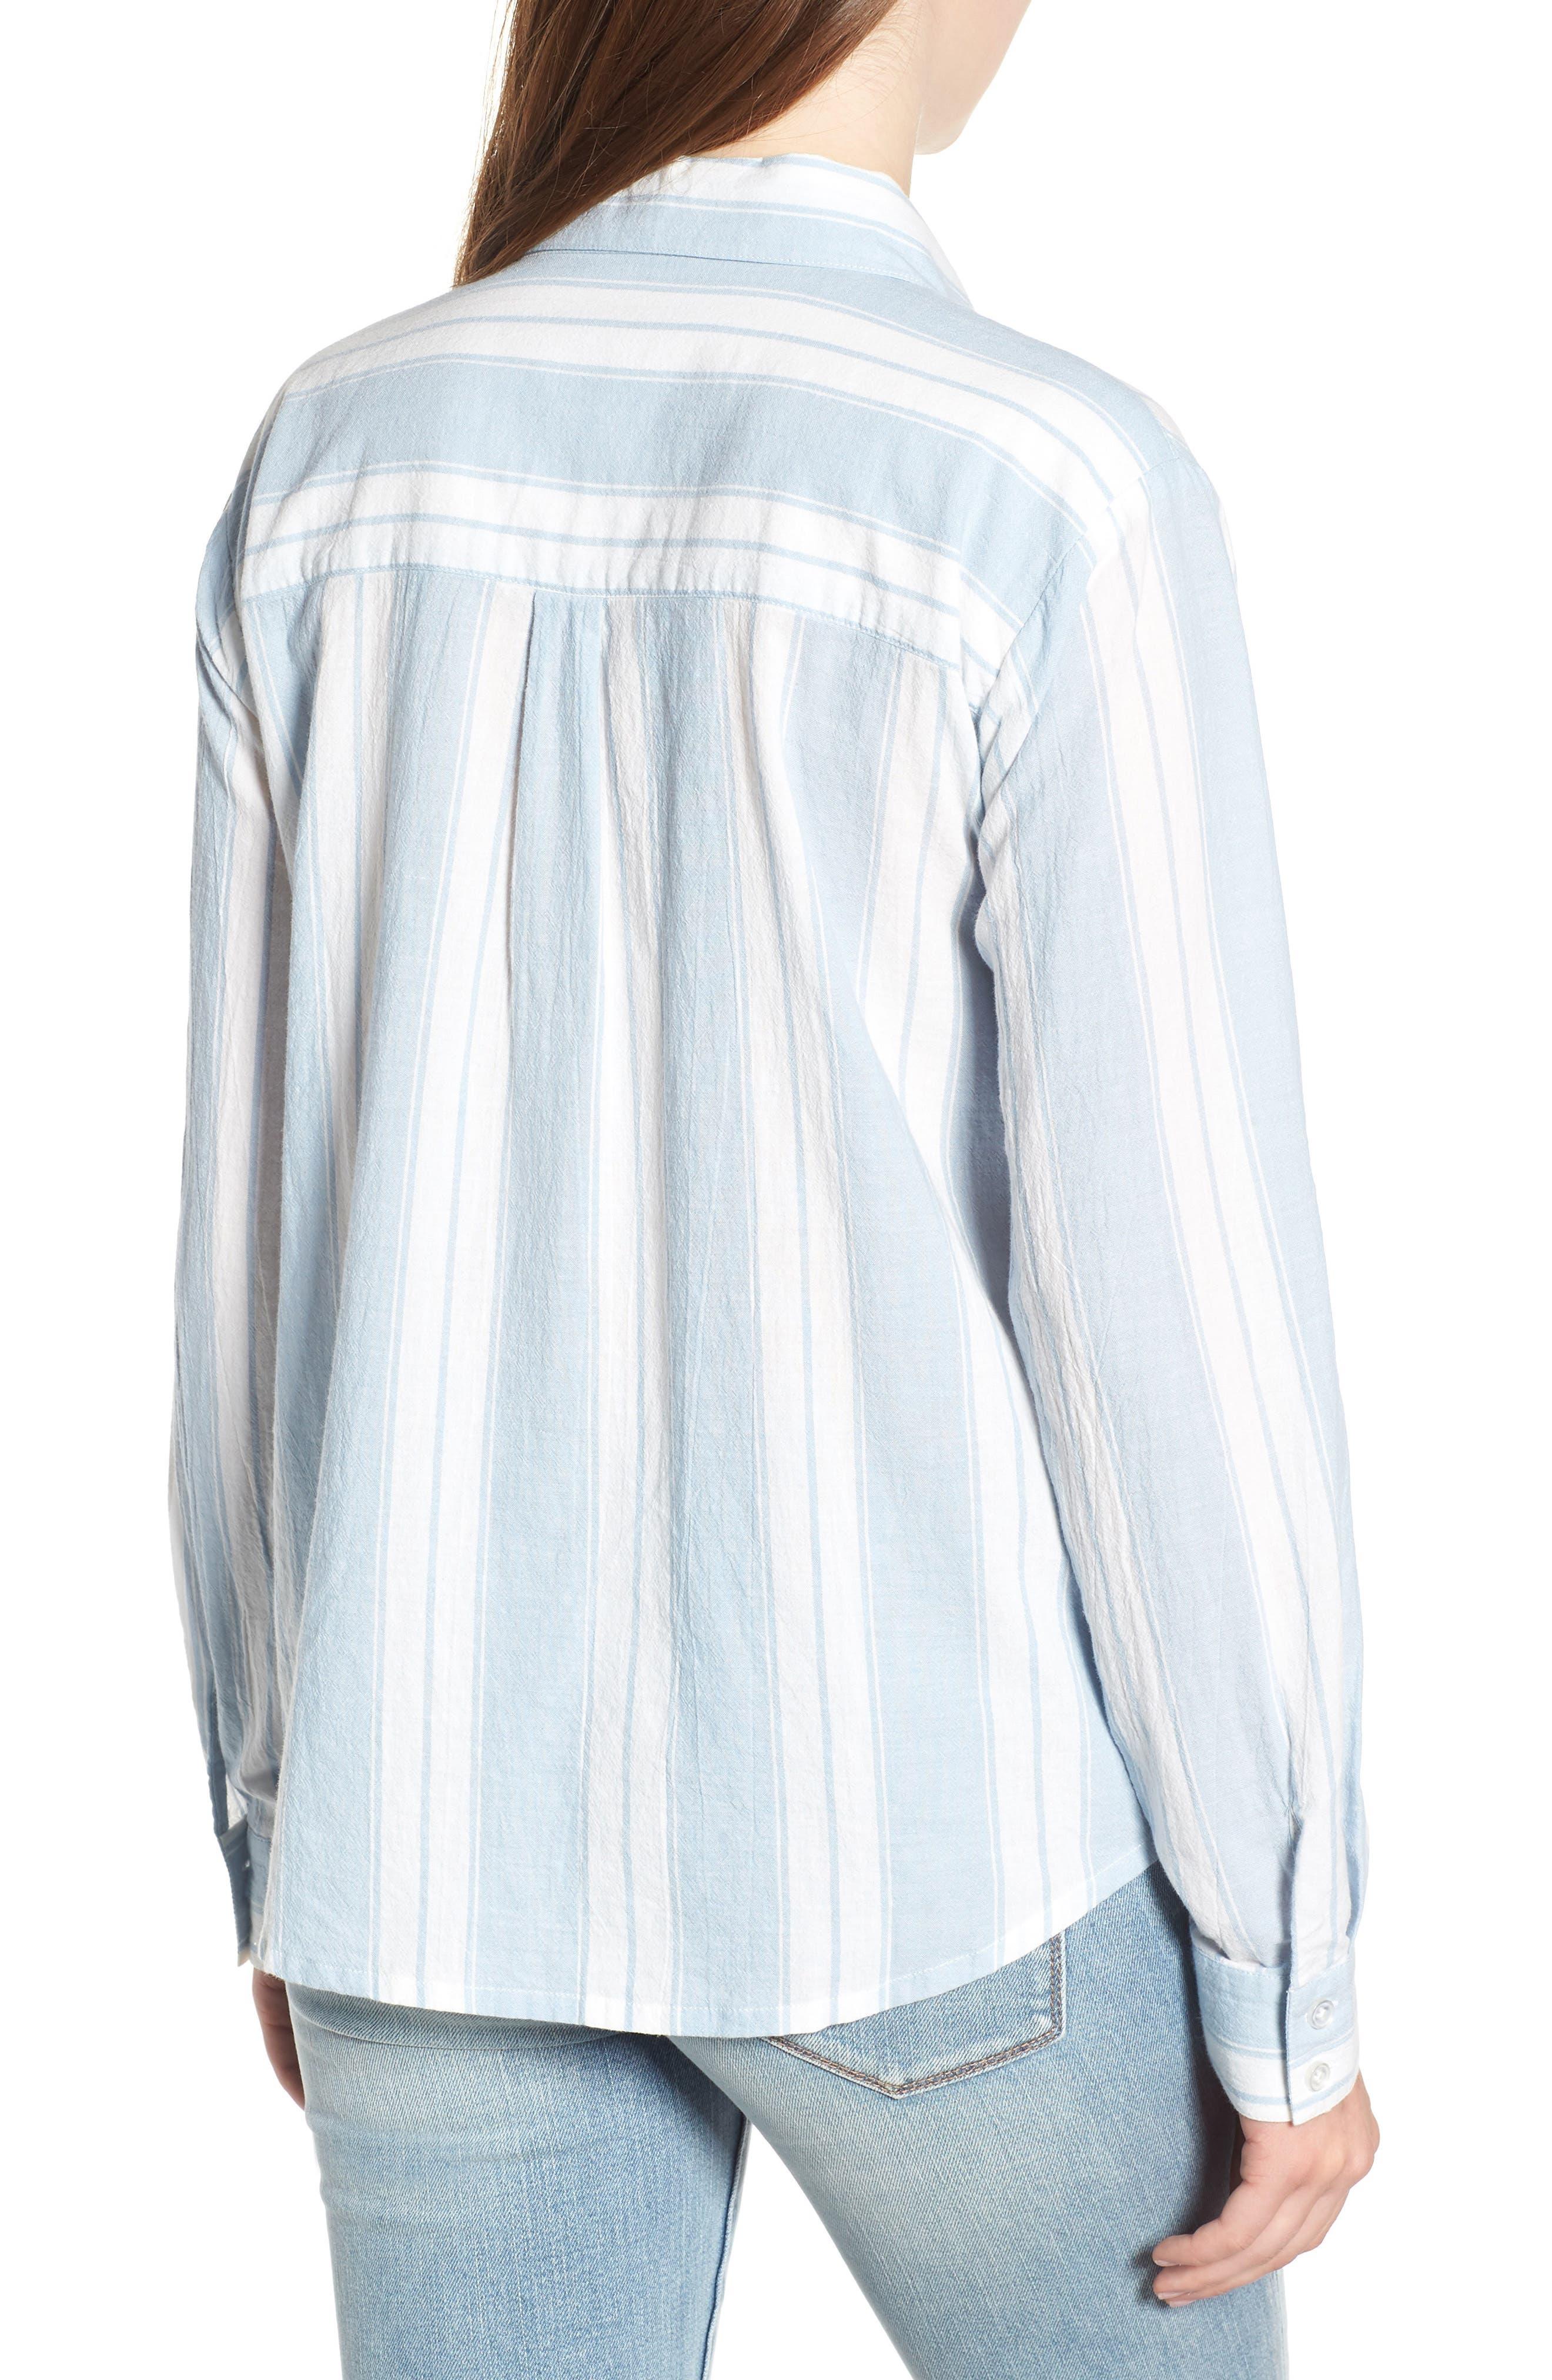 Bleach Stripe Chambray Top,                             Alternate thumbnail 2, color,                             Blue/ White